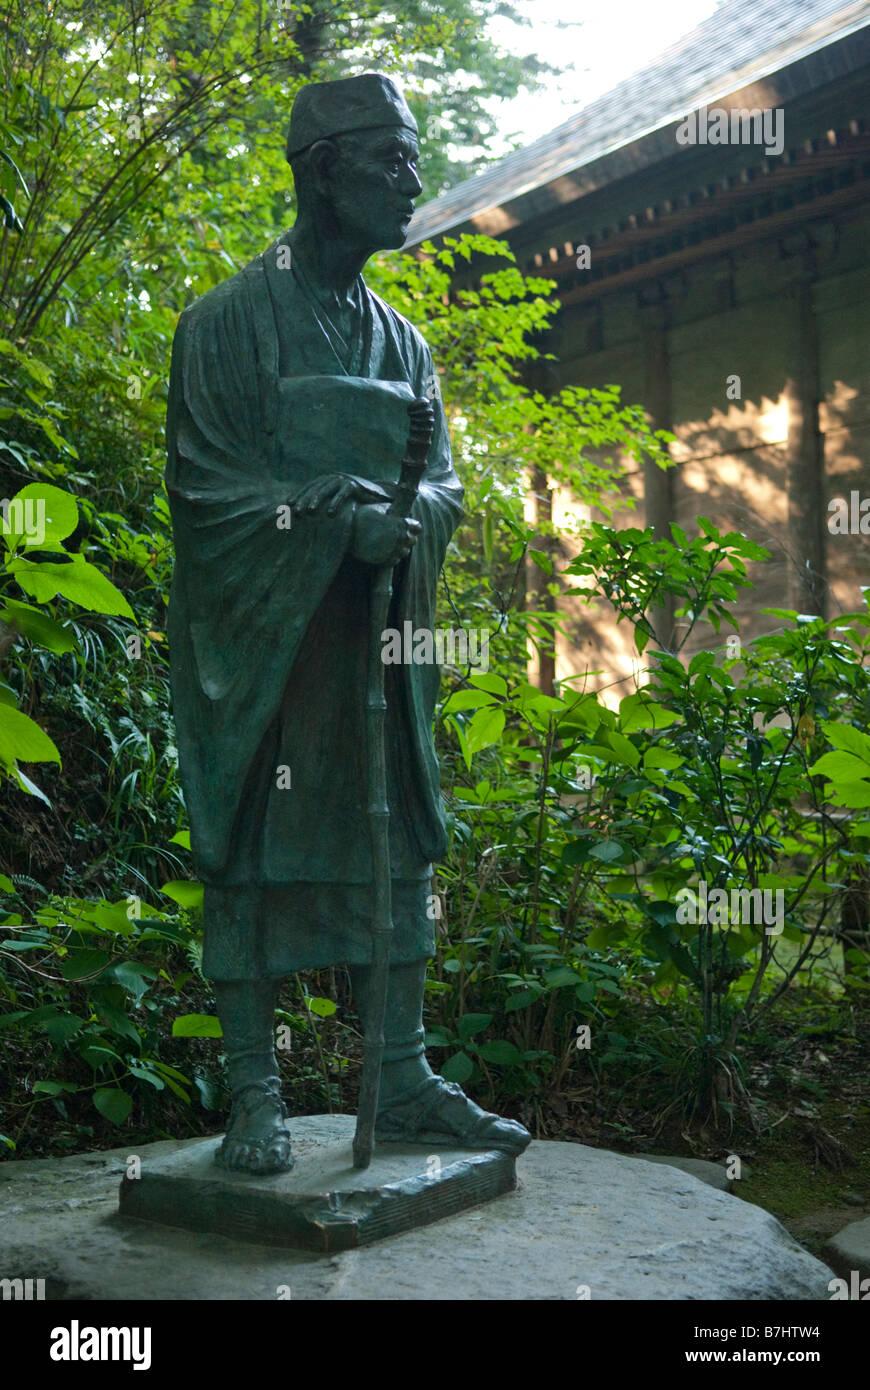 A statue of Matsuo Basho at Chusonji temple, Hiraizumi, Japan 28 August 2008. Stock Photo